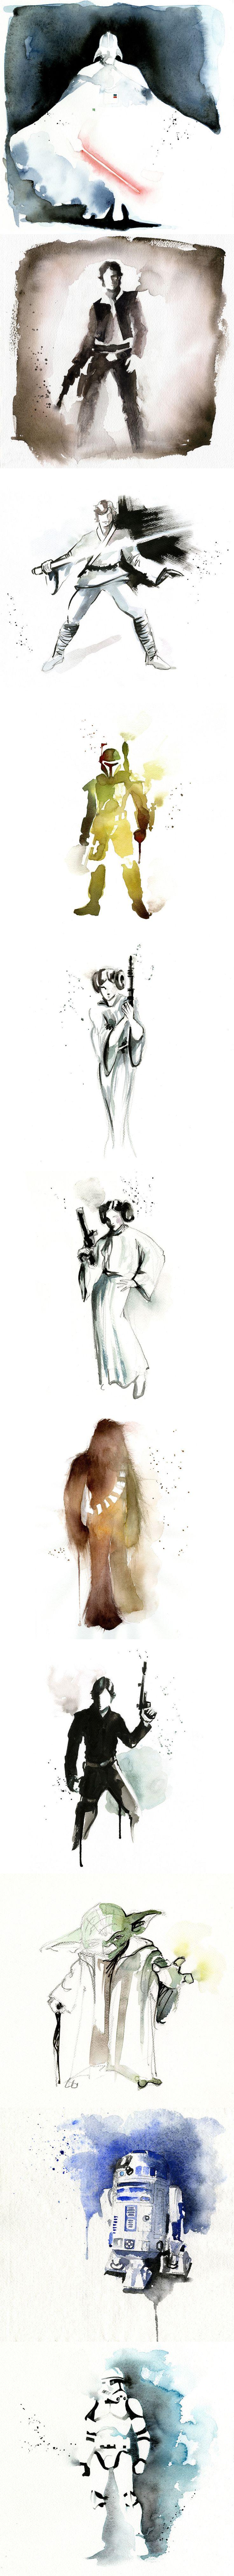 Star Wars Watercolor by Blule